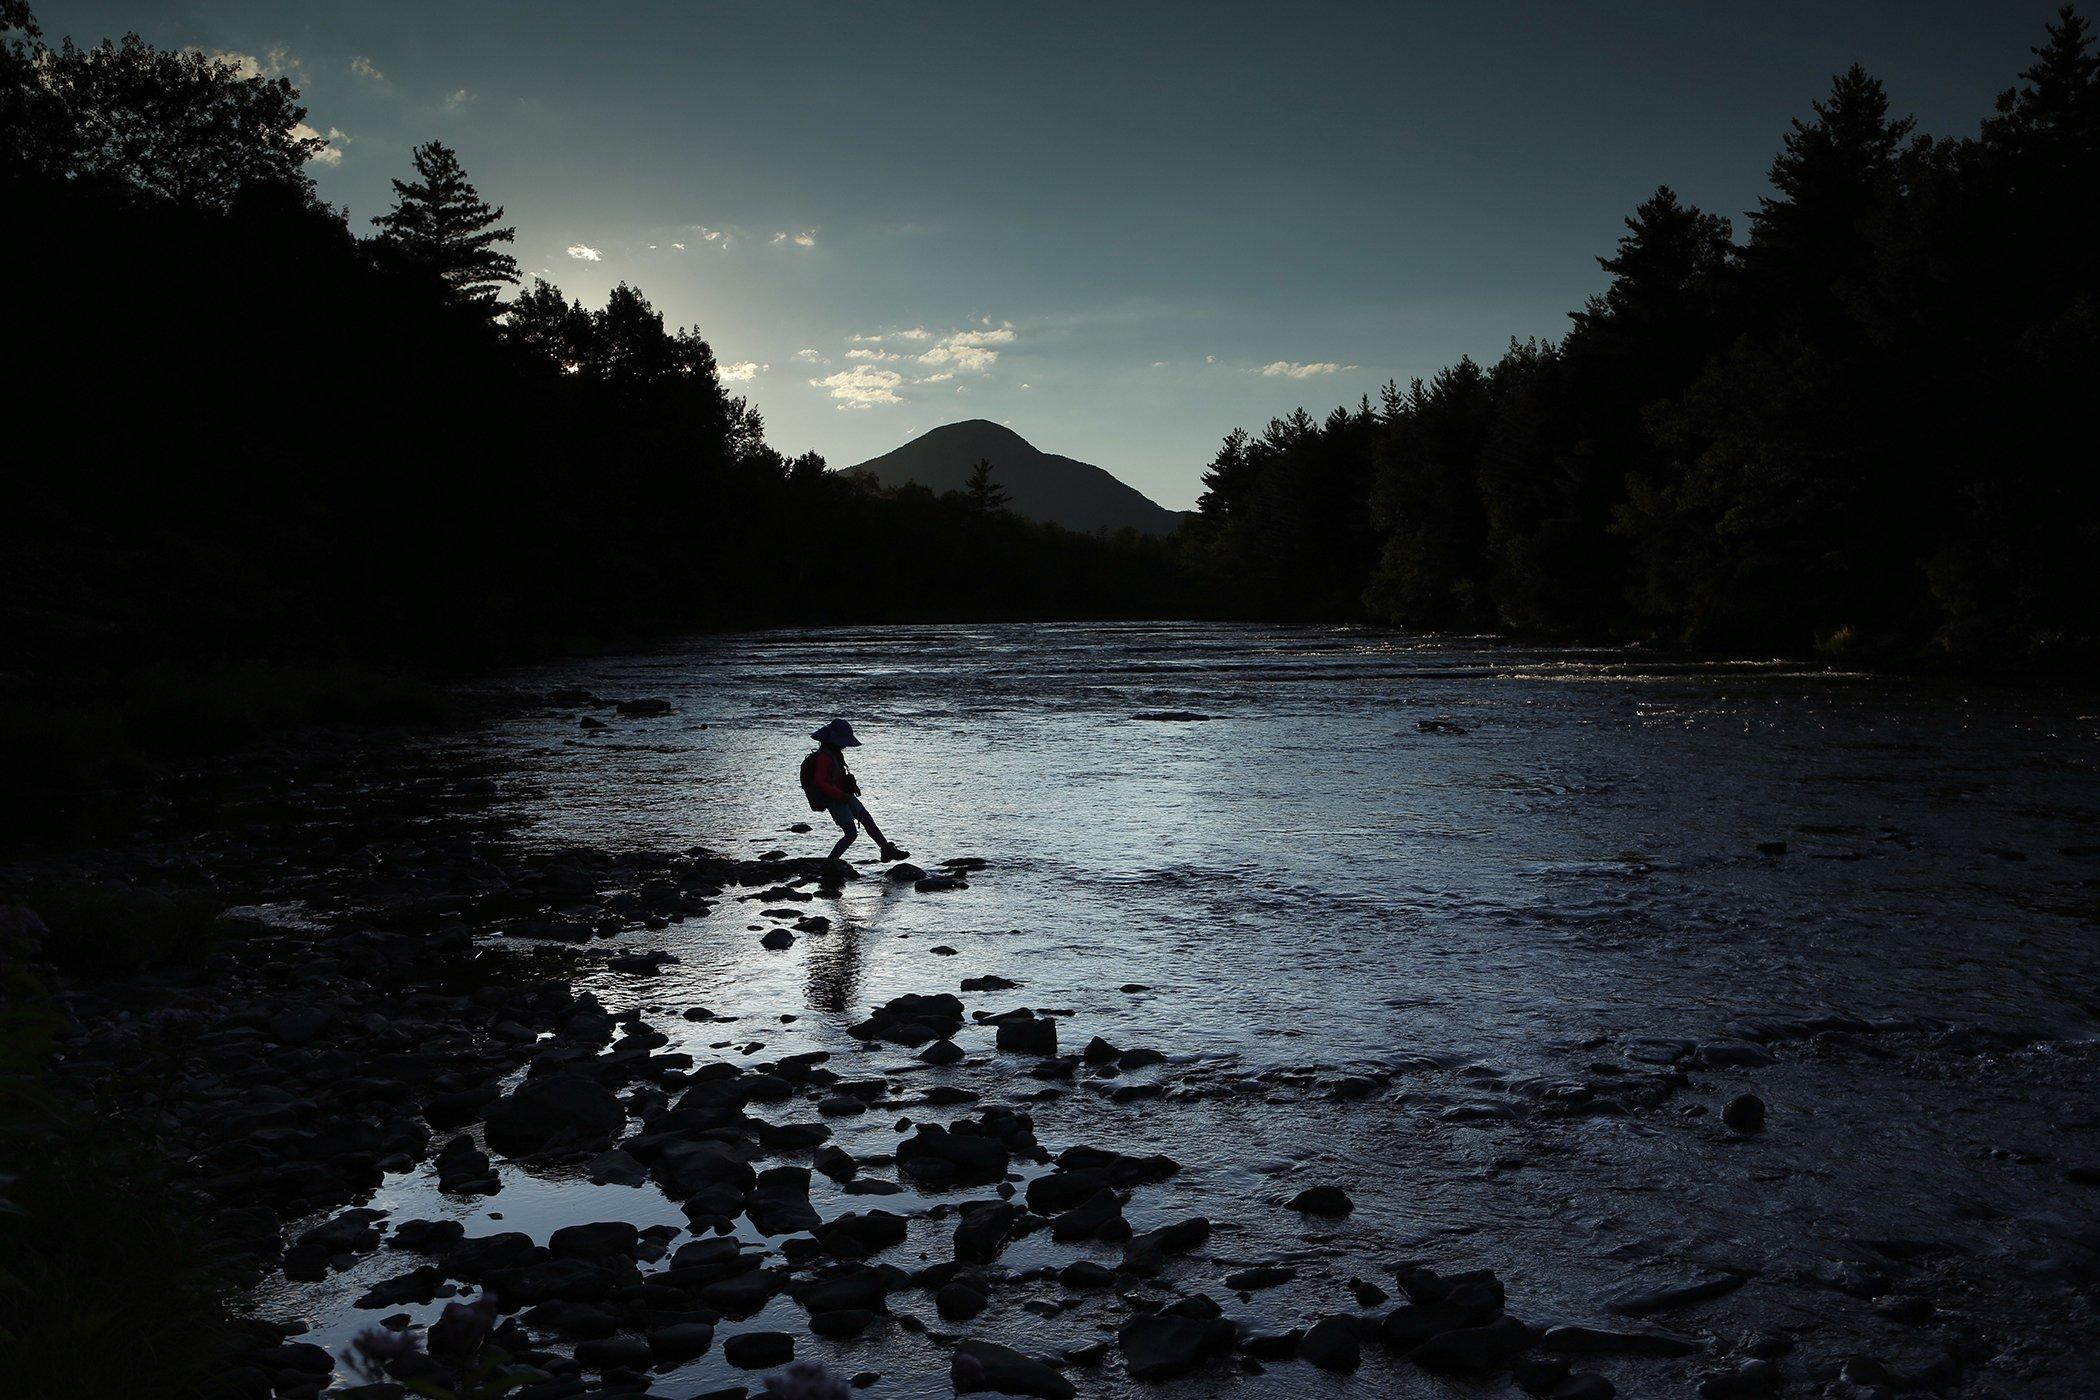 Environmental-Photos-Of-The-Year-01.jpg